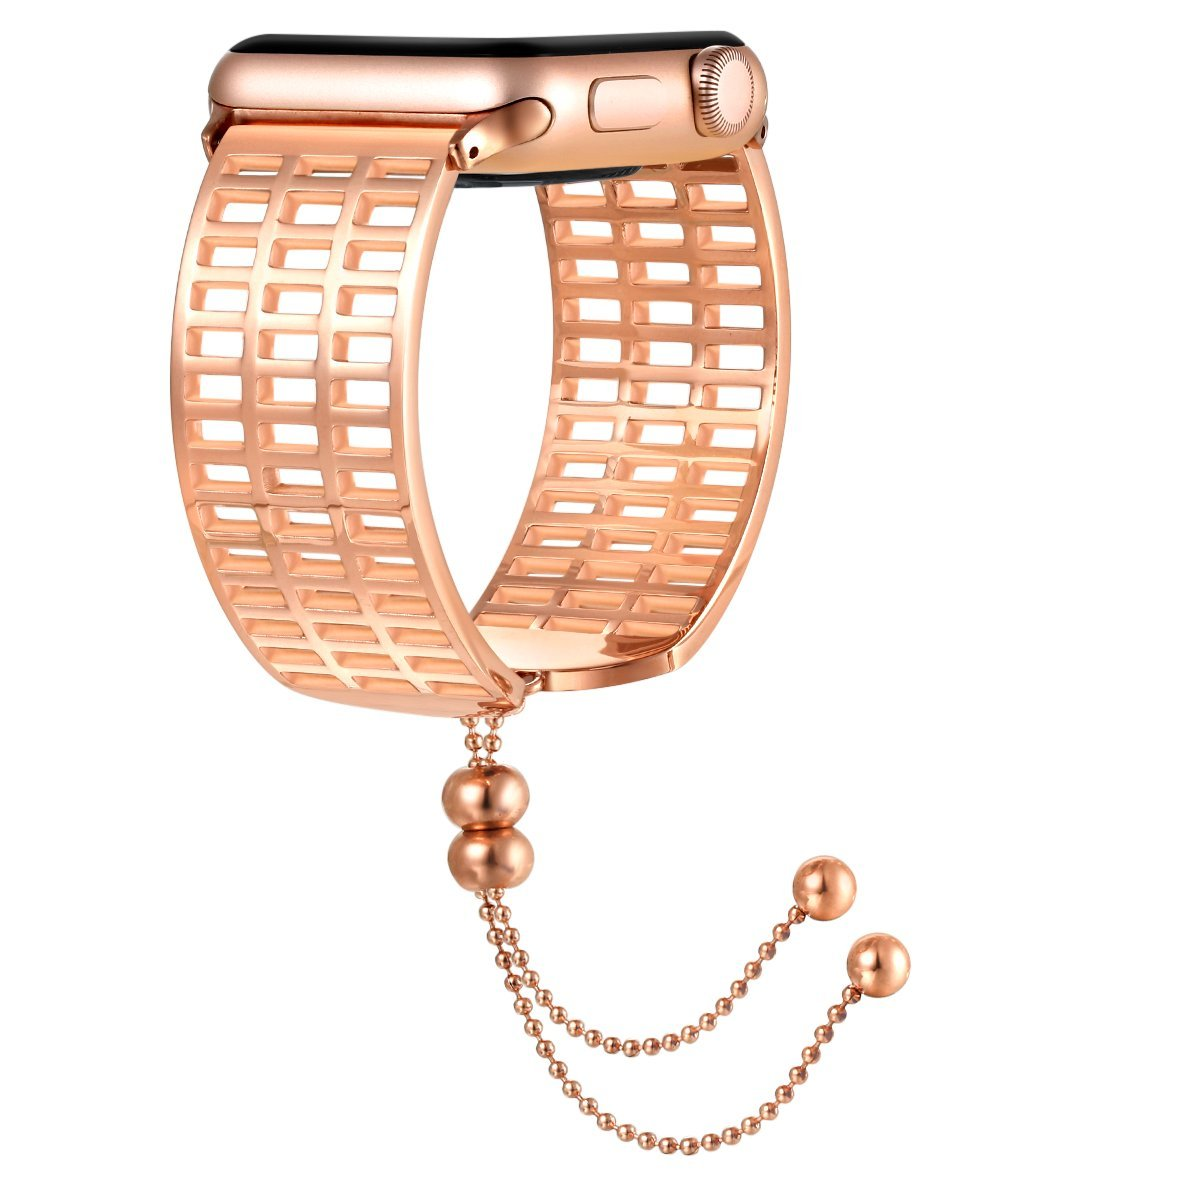 fastgo for Apple Watchバンド38 mm 42 mm、2018 6月最新released UniqueステンレススチールLuxury Vintage Genuine Feminine交換用ストラップシリーズ3 / 2 / 1レディースガールズ調節可能 B07DHFN631 Rose Gold-38mm Rose Gold-38mm